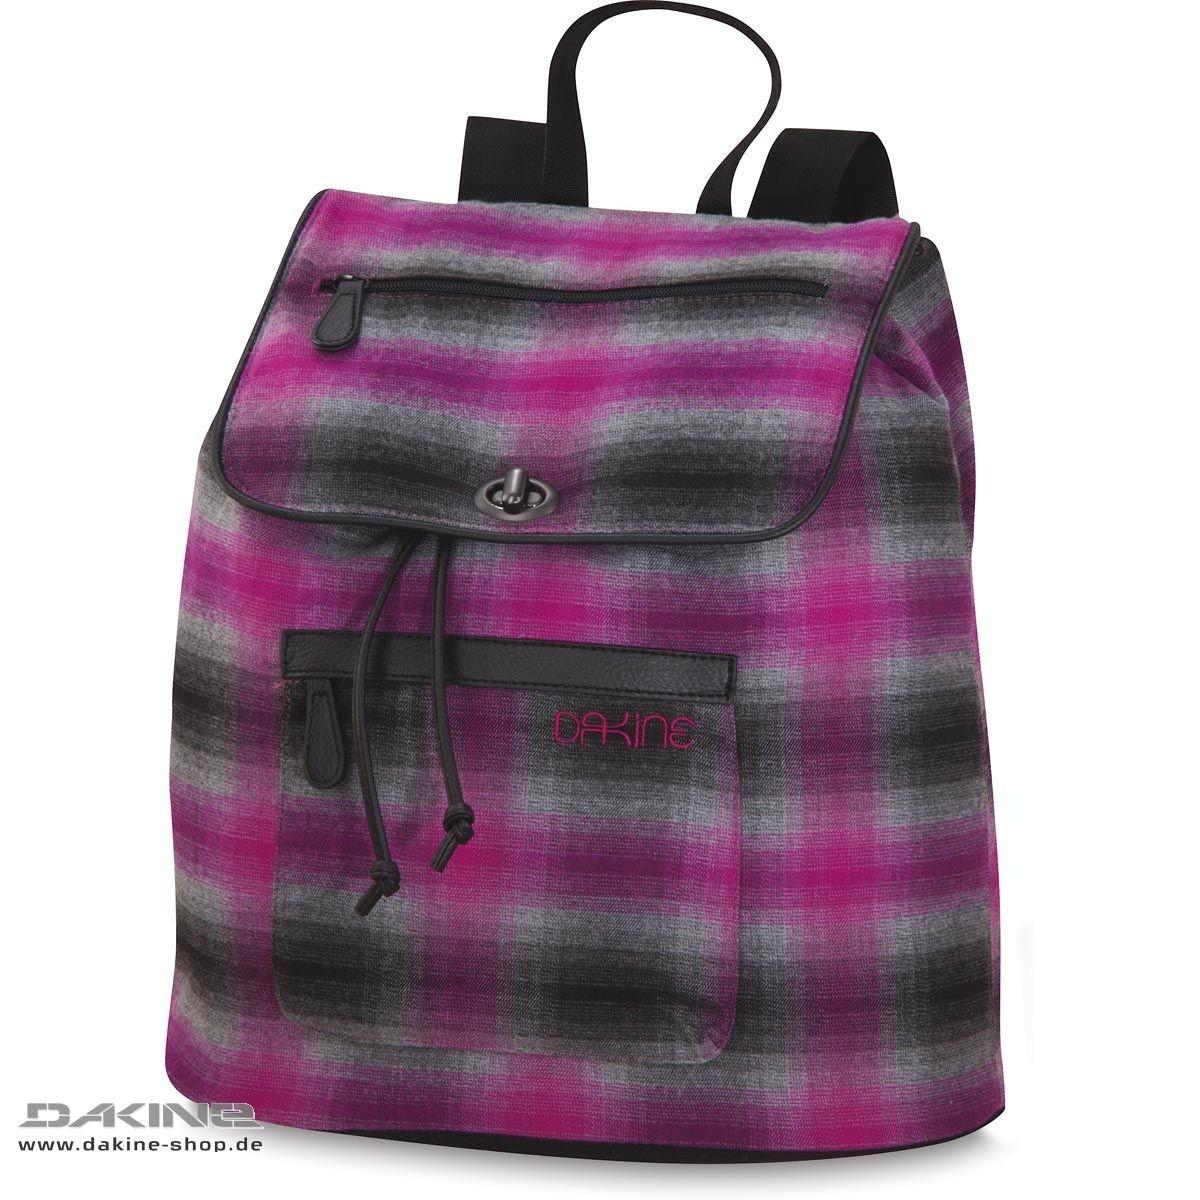 a1bd4760a462c Dakine Sophia 20L Backpack Chalet